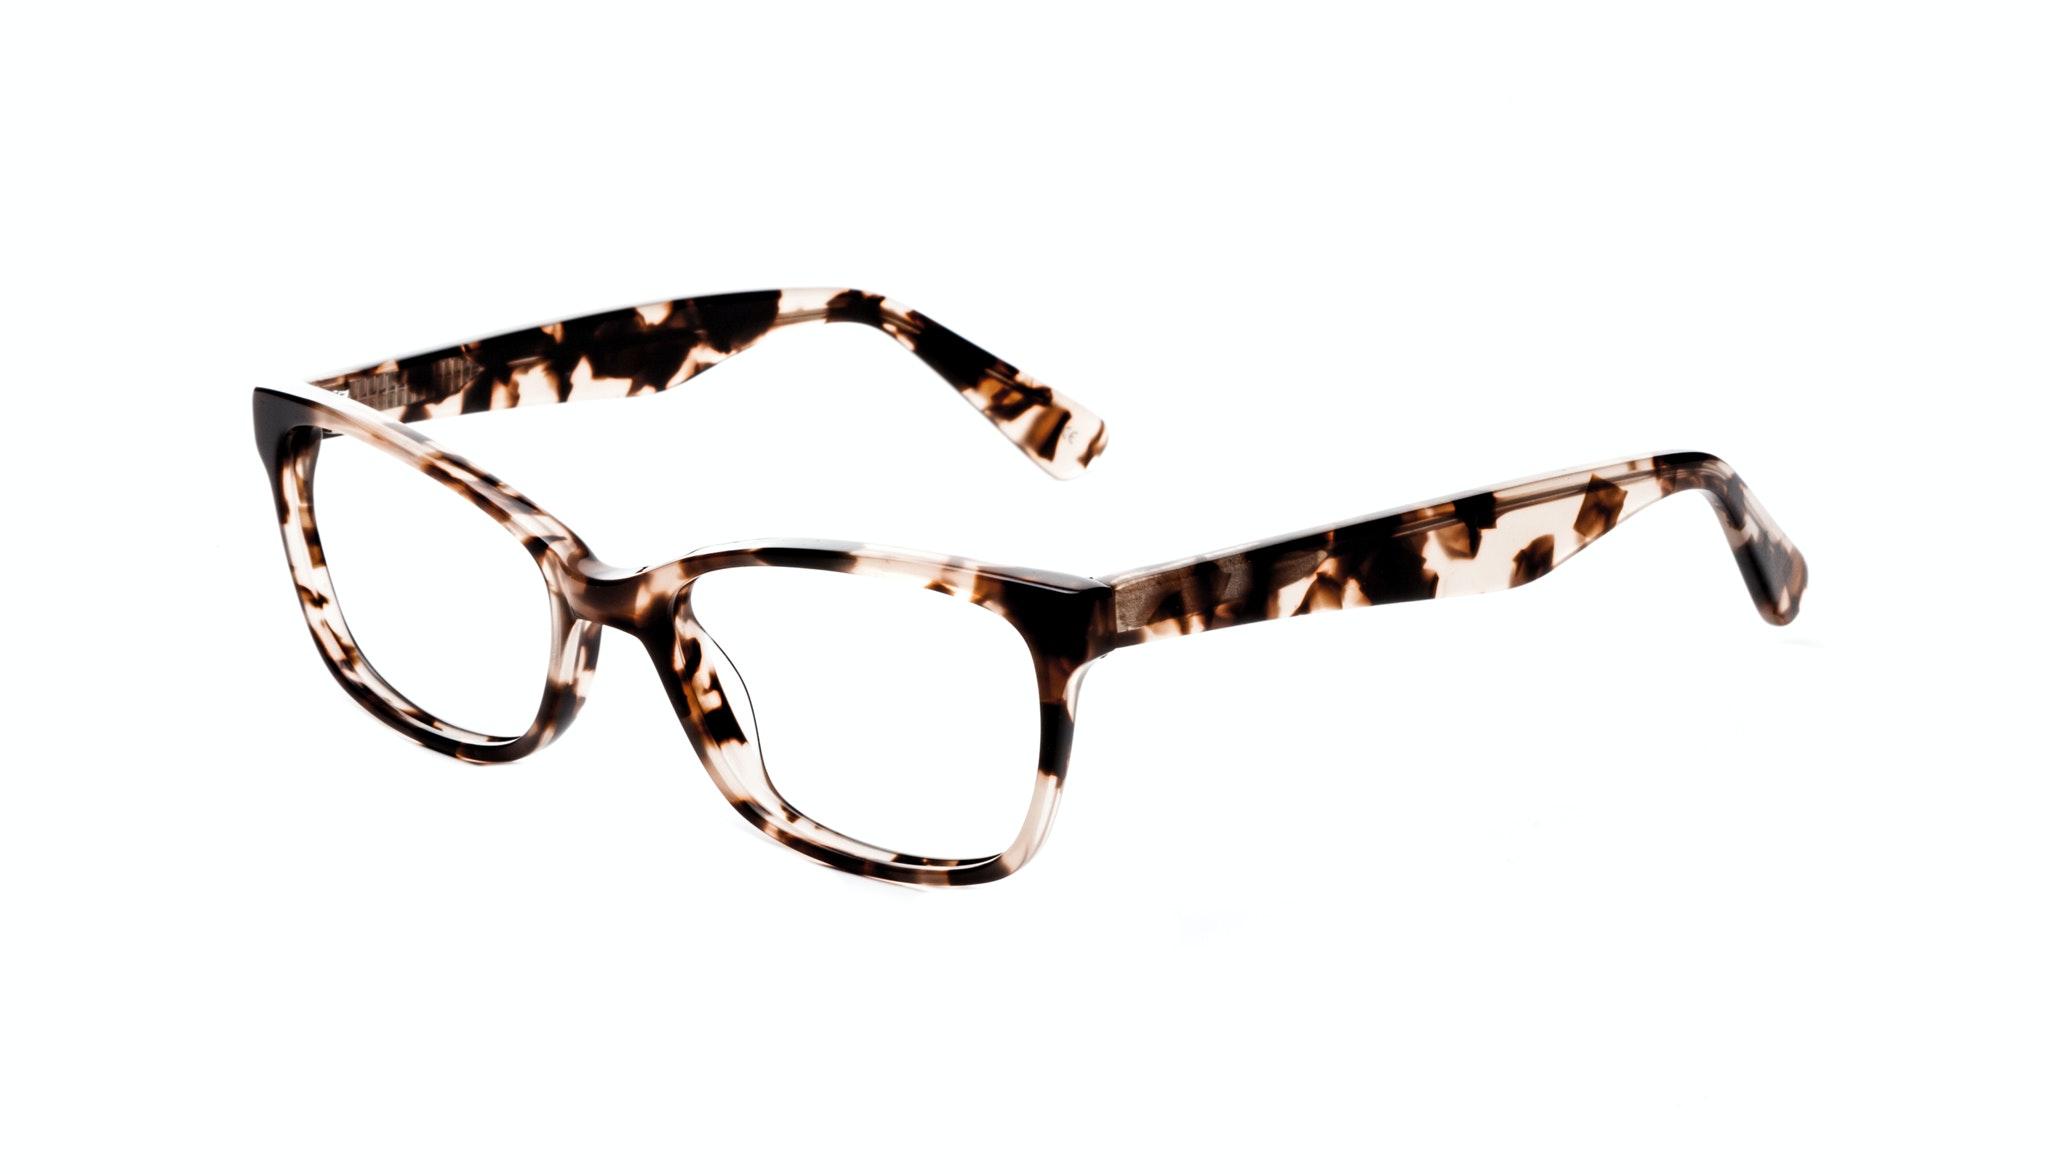 Affordable Fashion Glasses Cat Eye Rectangle Square Eyeglasses Women Comet Pink Tortoise Tilt